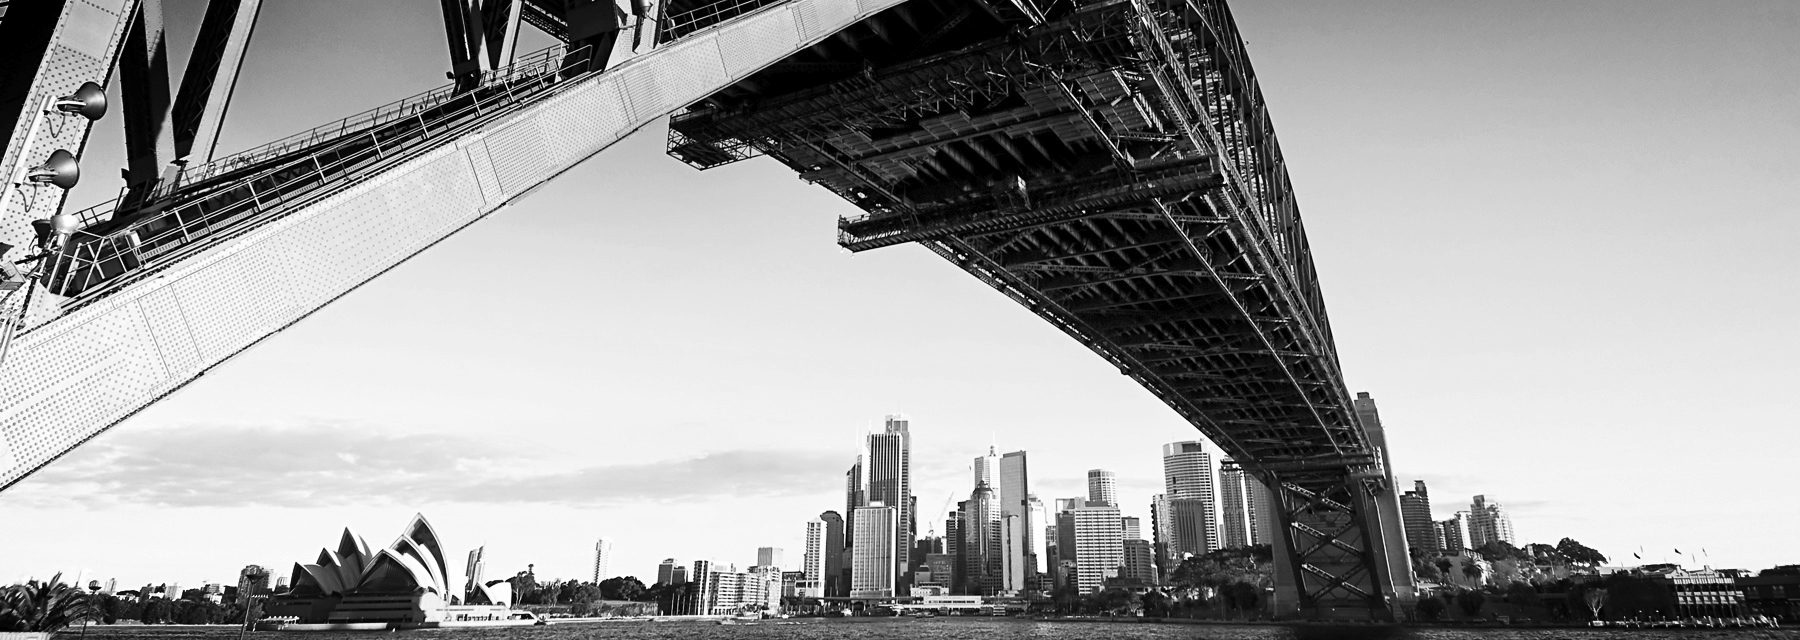 daa-office-view-sydney.jpg